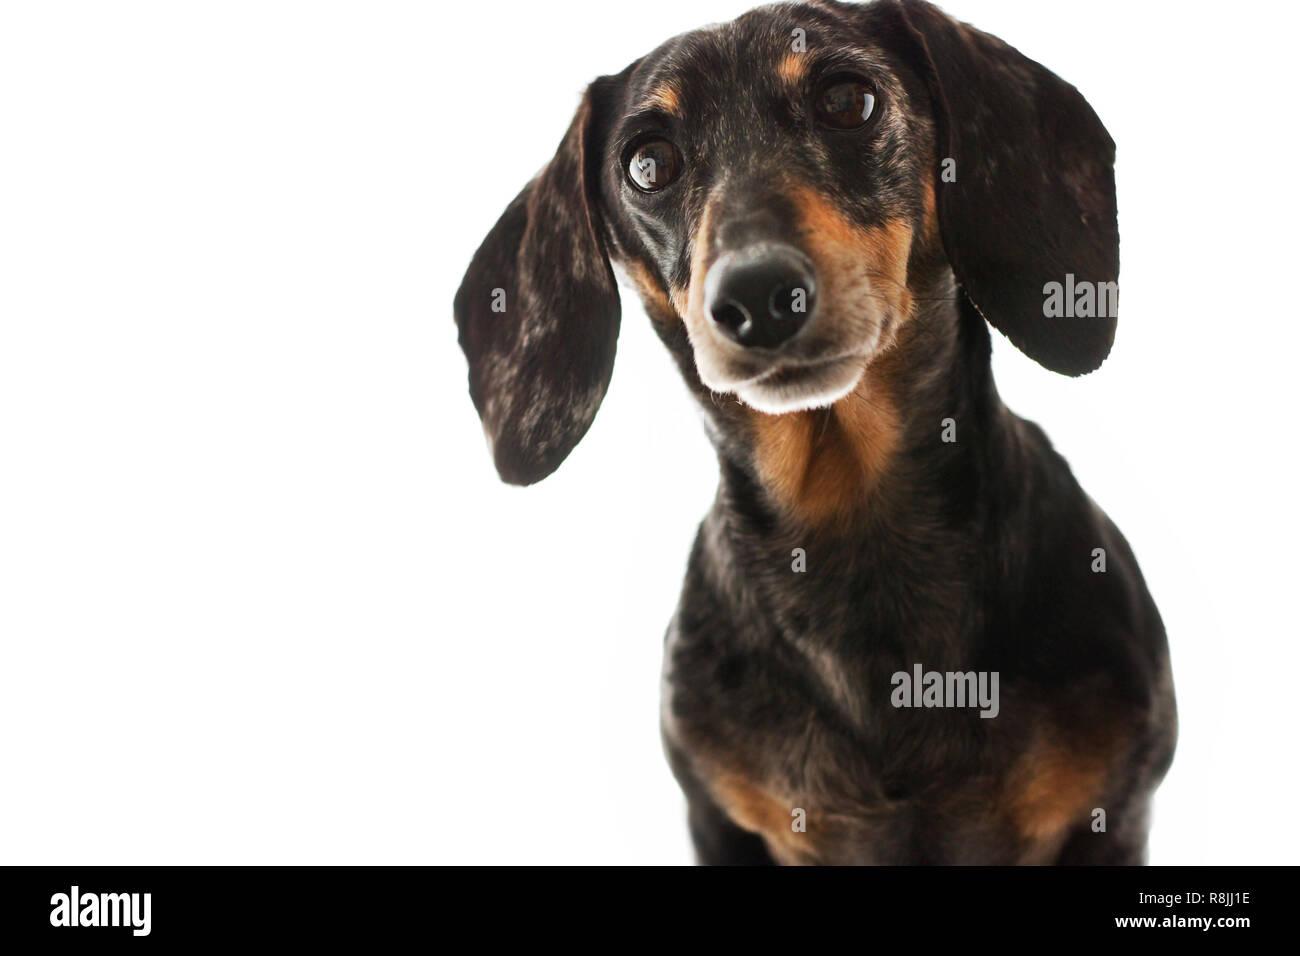 Senior Miniature Black and Tan Dapple Dachshund with White Background - Stock Image